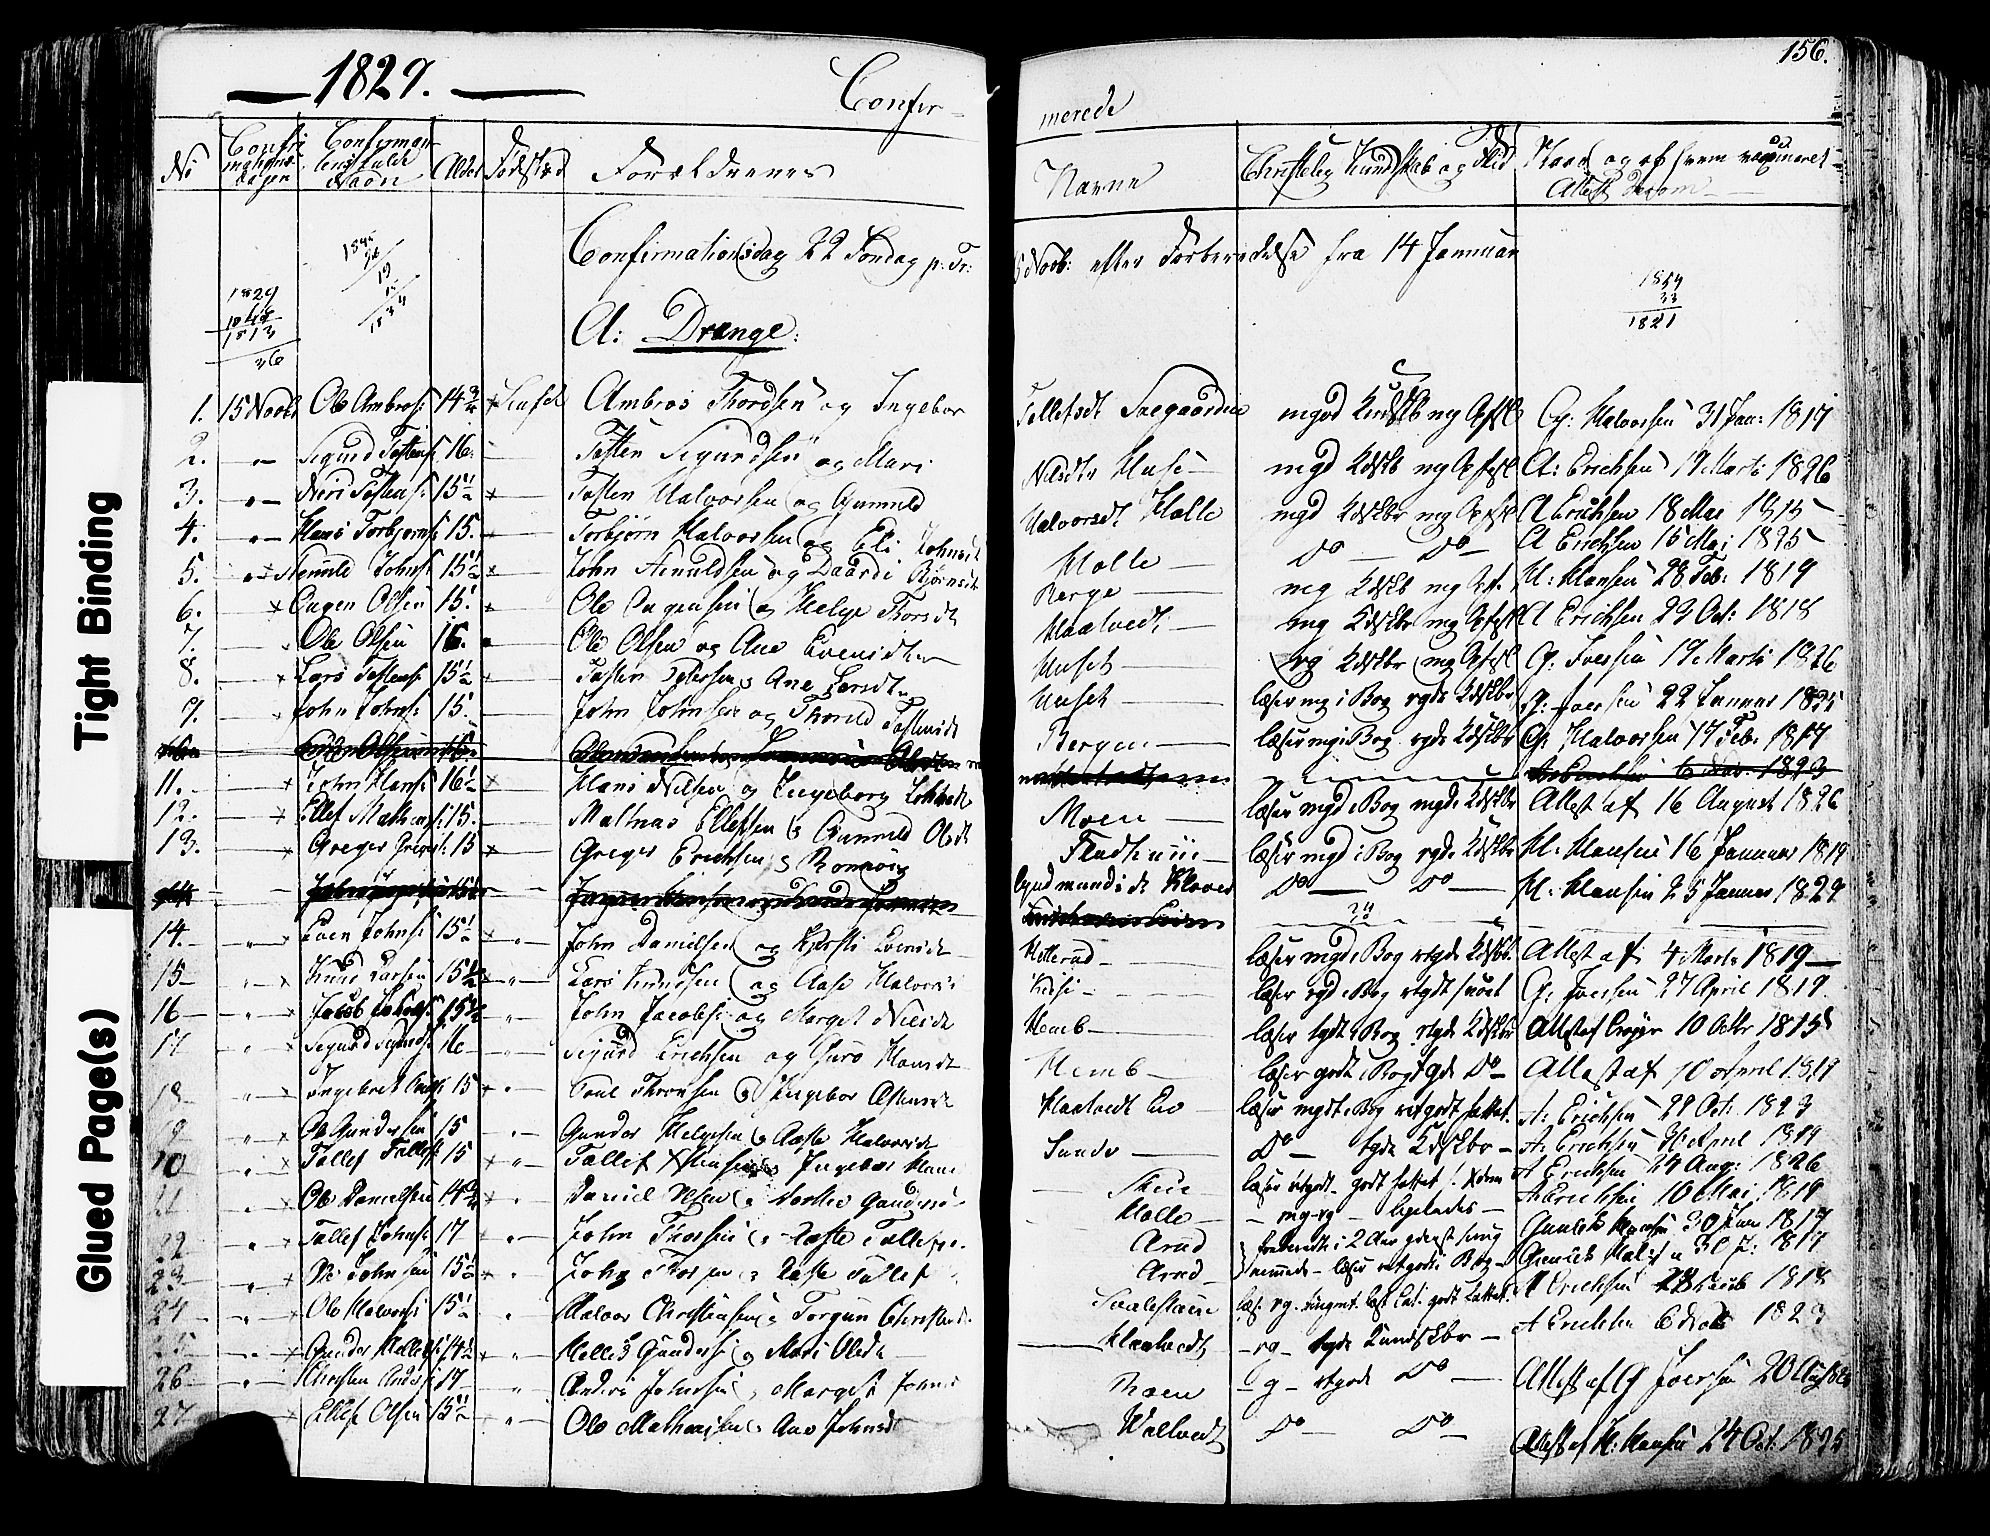 SAKO, Sauherad kirkebøker, F/Fa/L0006: Ministerialbok nr. I 6, 1827-1850, s. 156